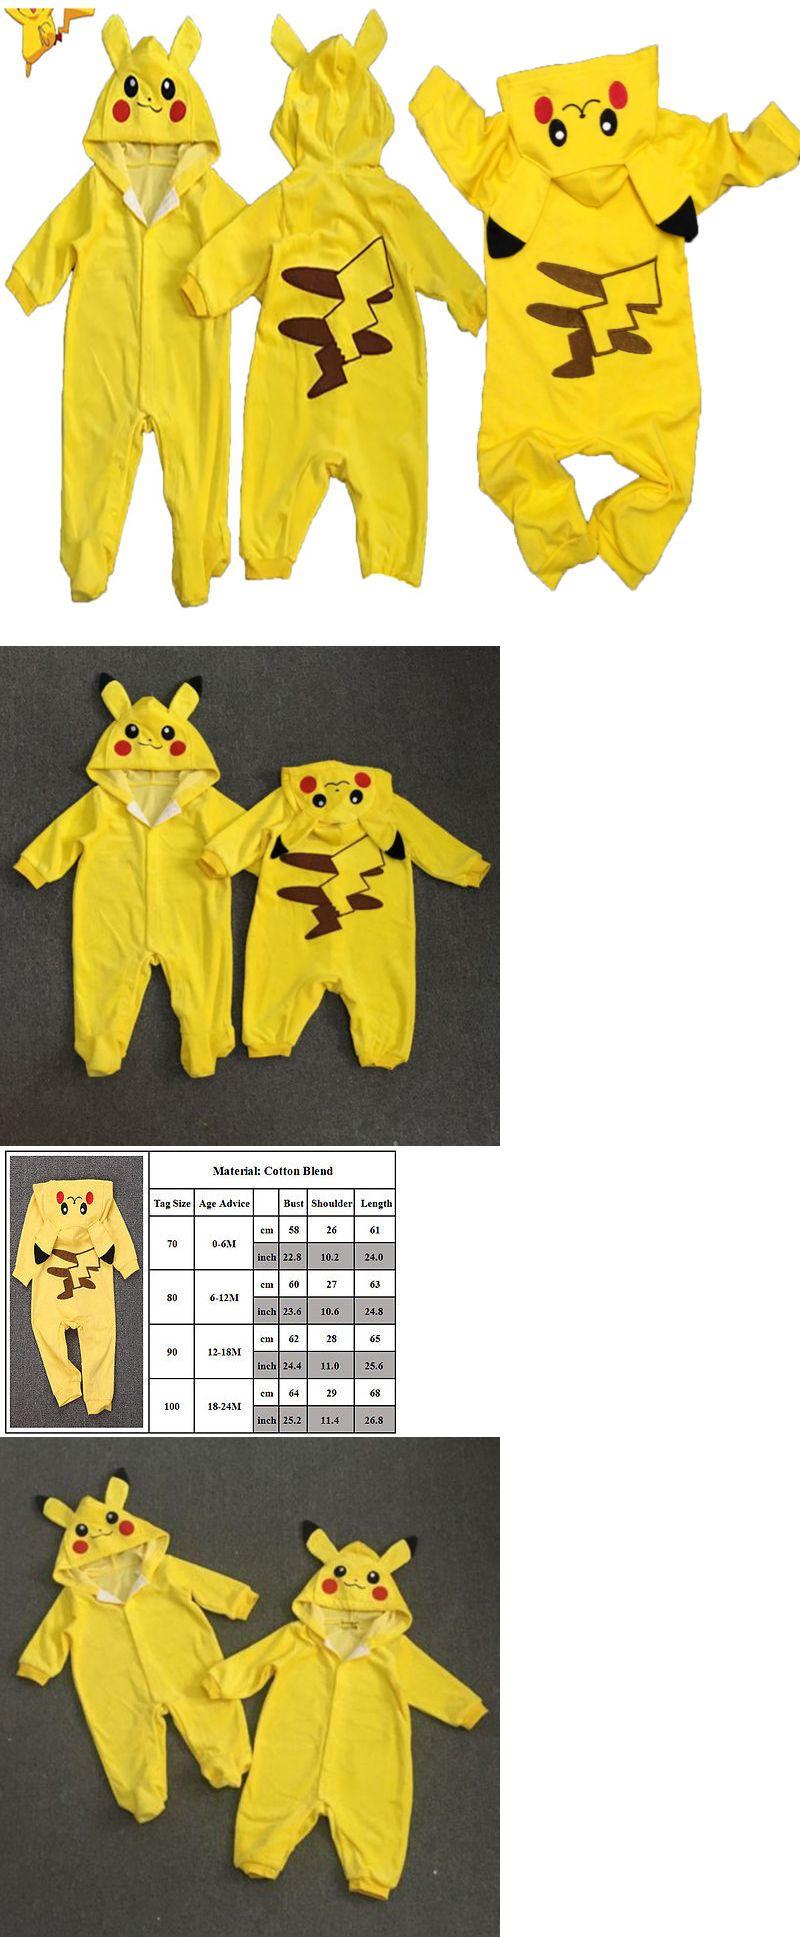 08c88a0b3 Boys Clothing Newborn-5T 147317: Pokemon Pikachu Newborn Boys Girls Romper  Baby Pajamas Hooded Costume Cosplay Us -> BUY IT NOW ONLY: $10.22 on #eBay  ...